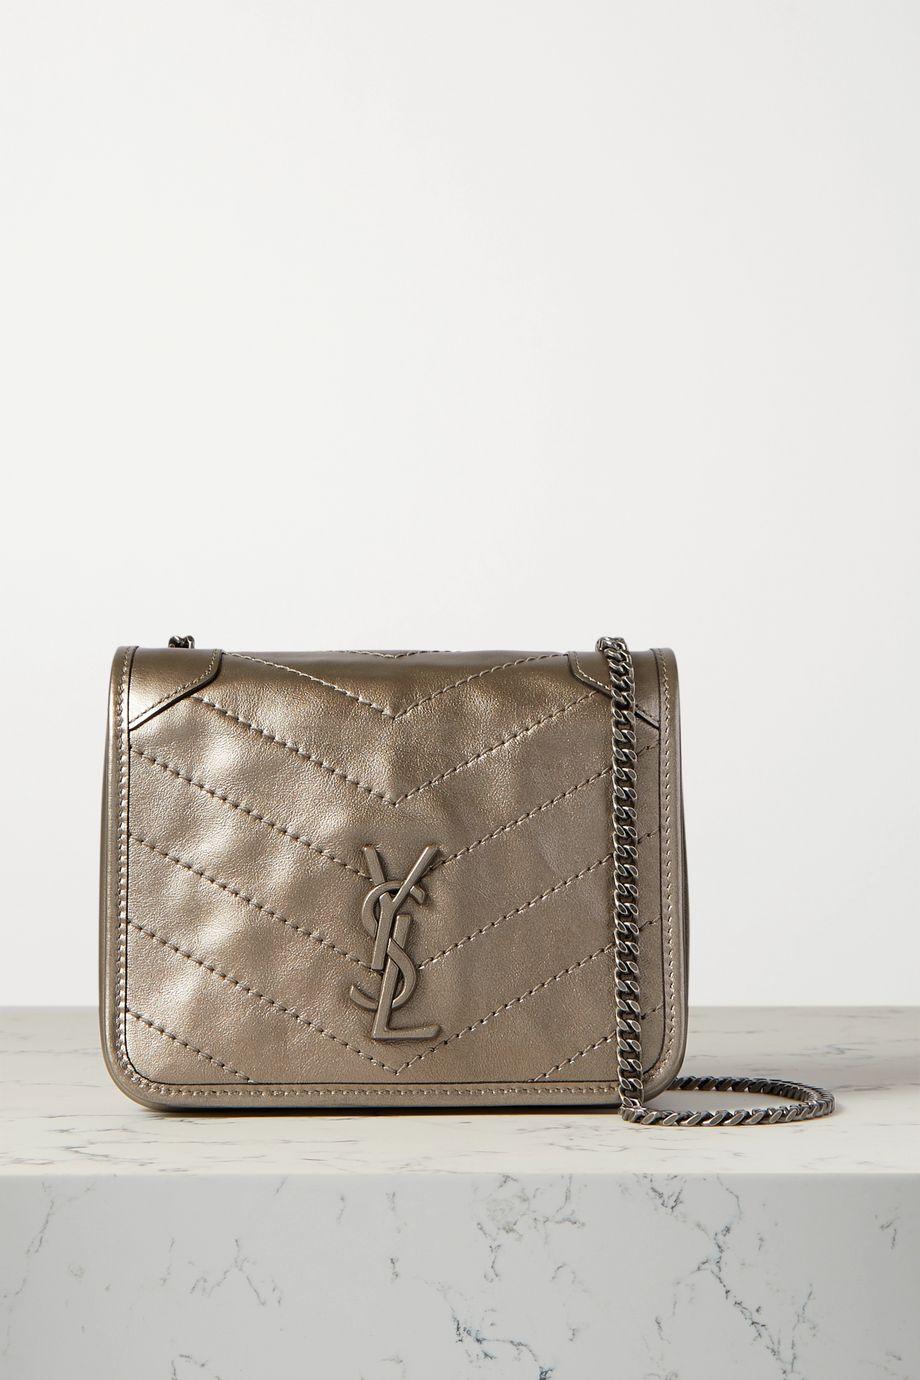 SAINT LAURENT Niki mini quilted metallic leather shoulder bag